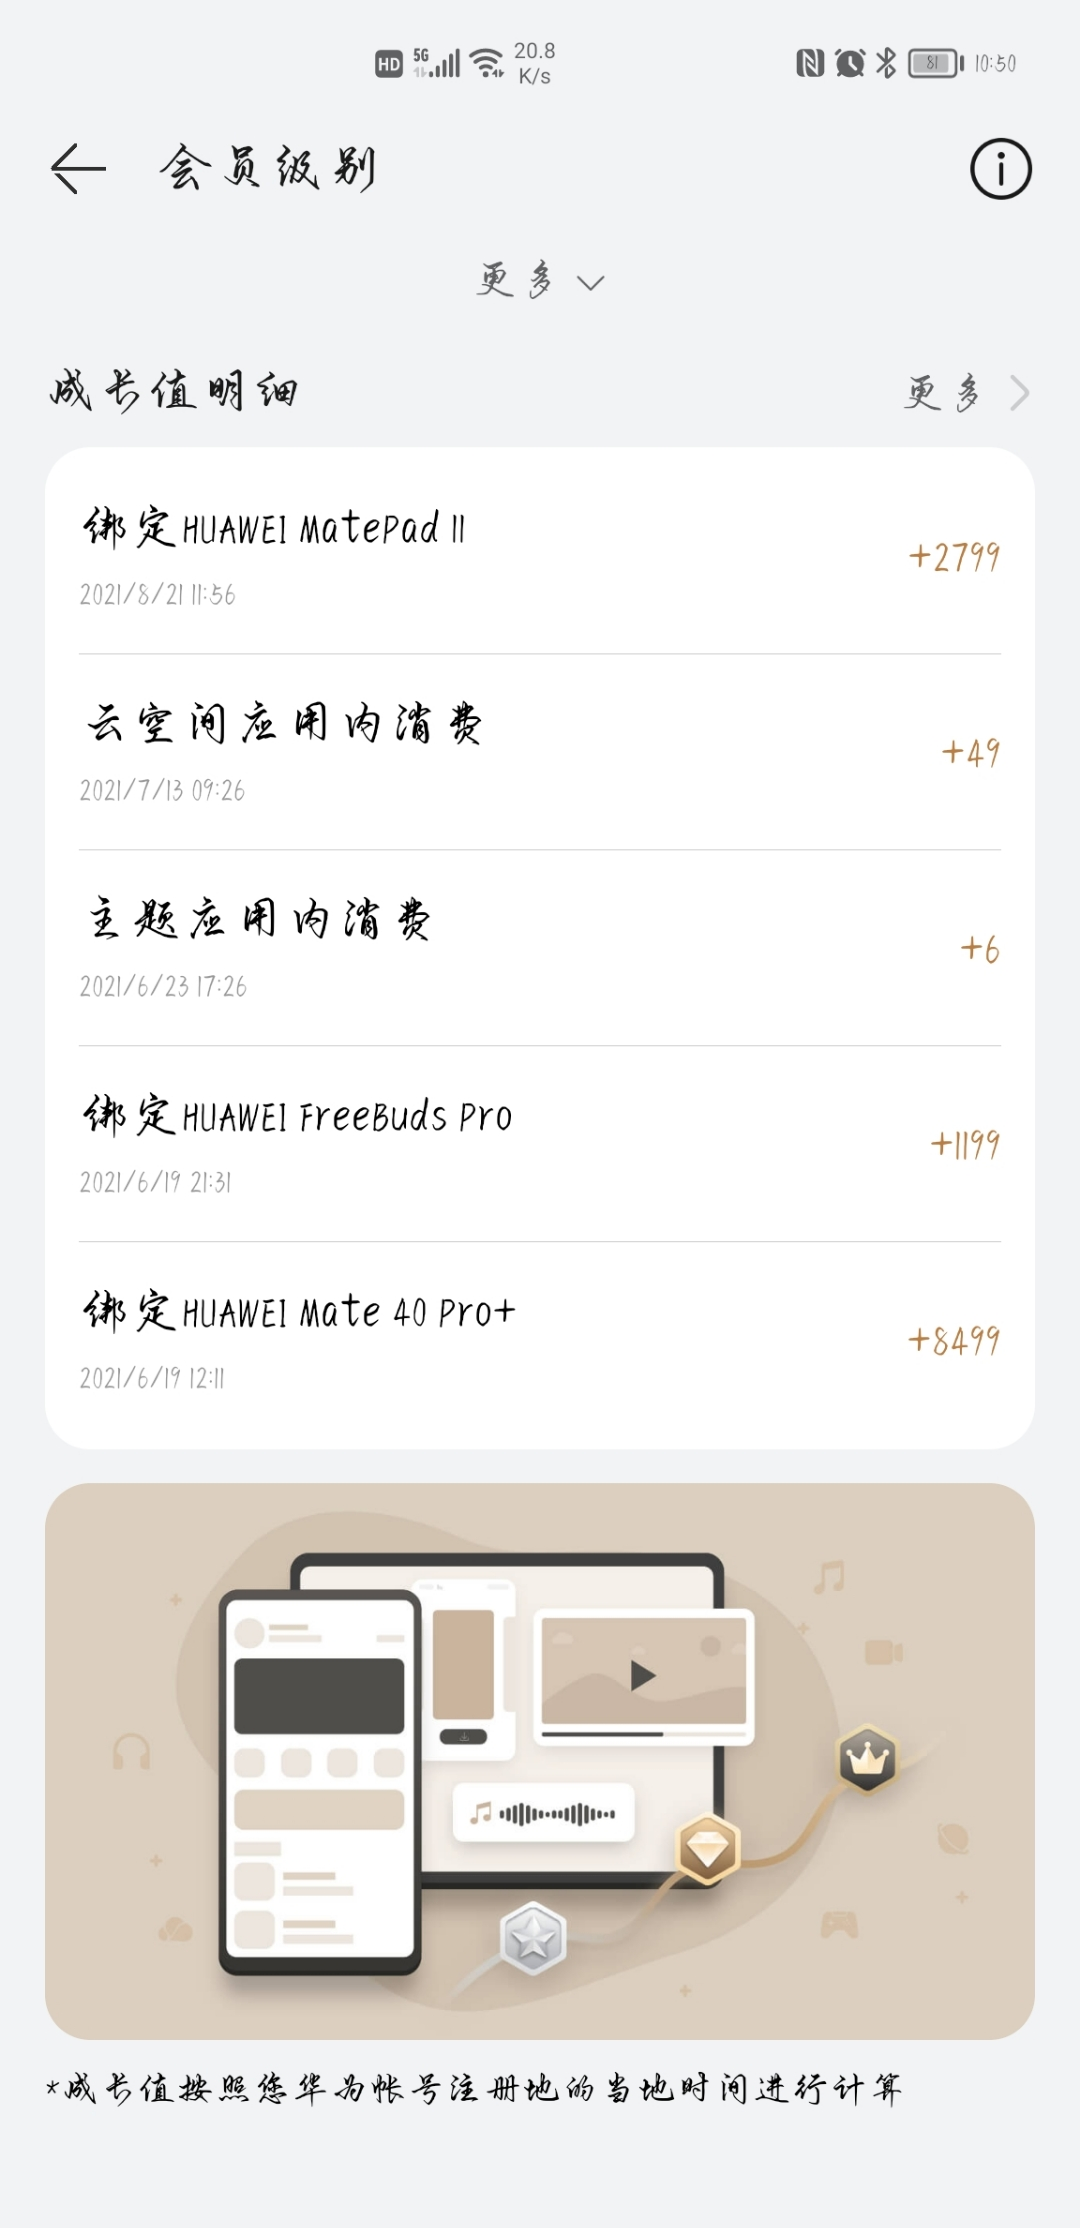 Screenshot_20210831_105054_com.huawei.mycenter.jpg